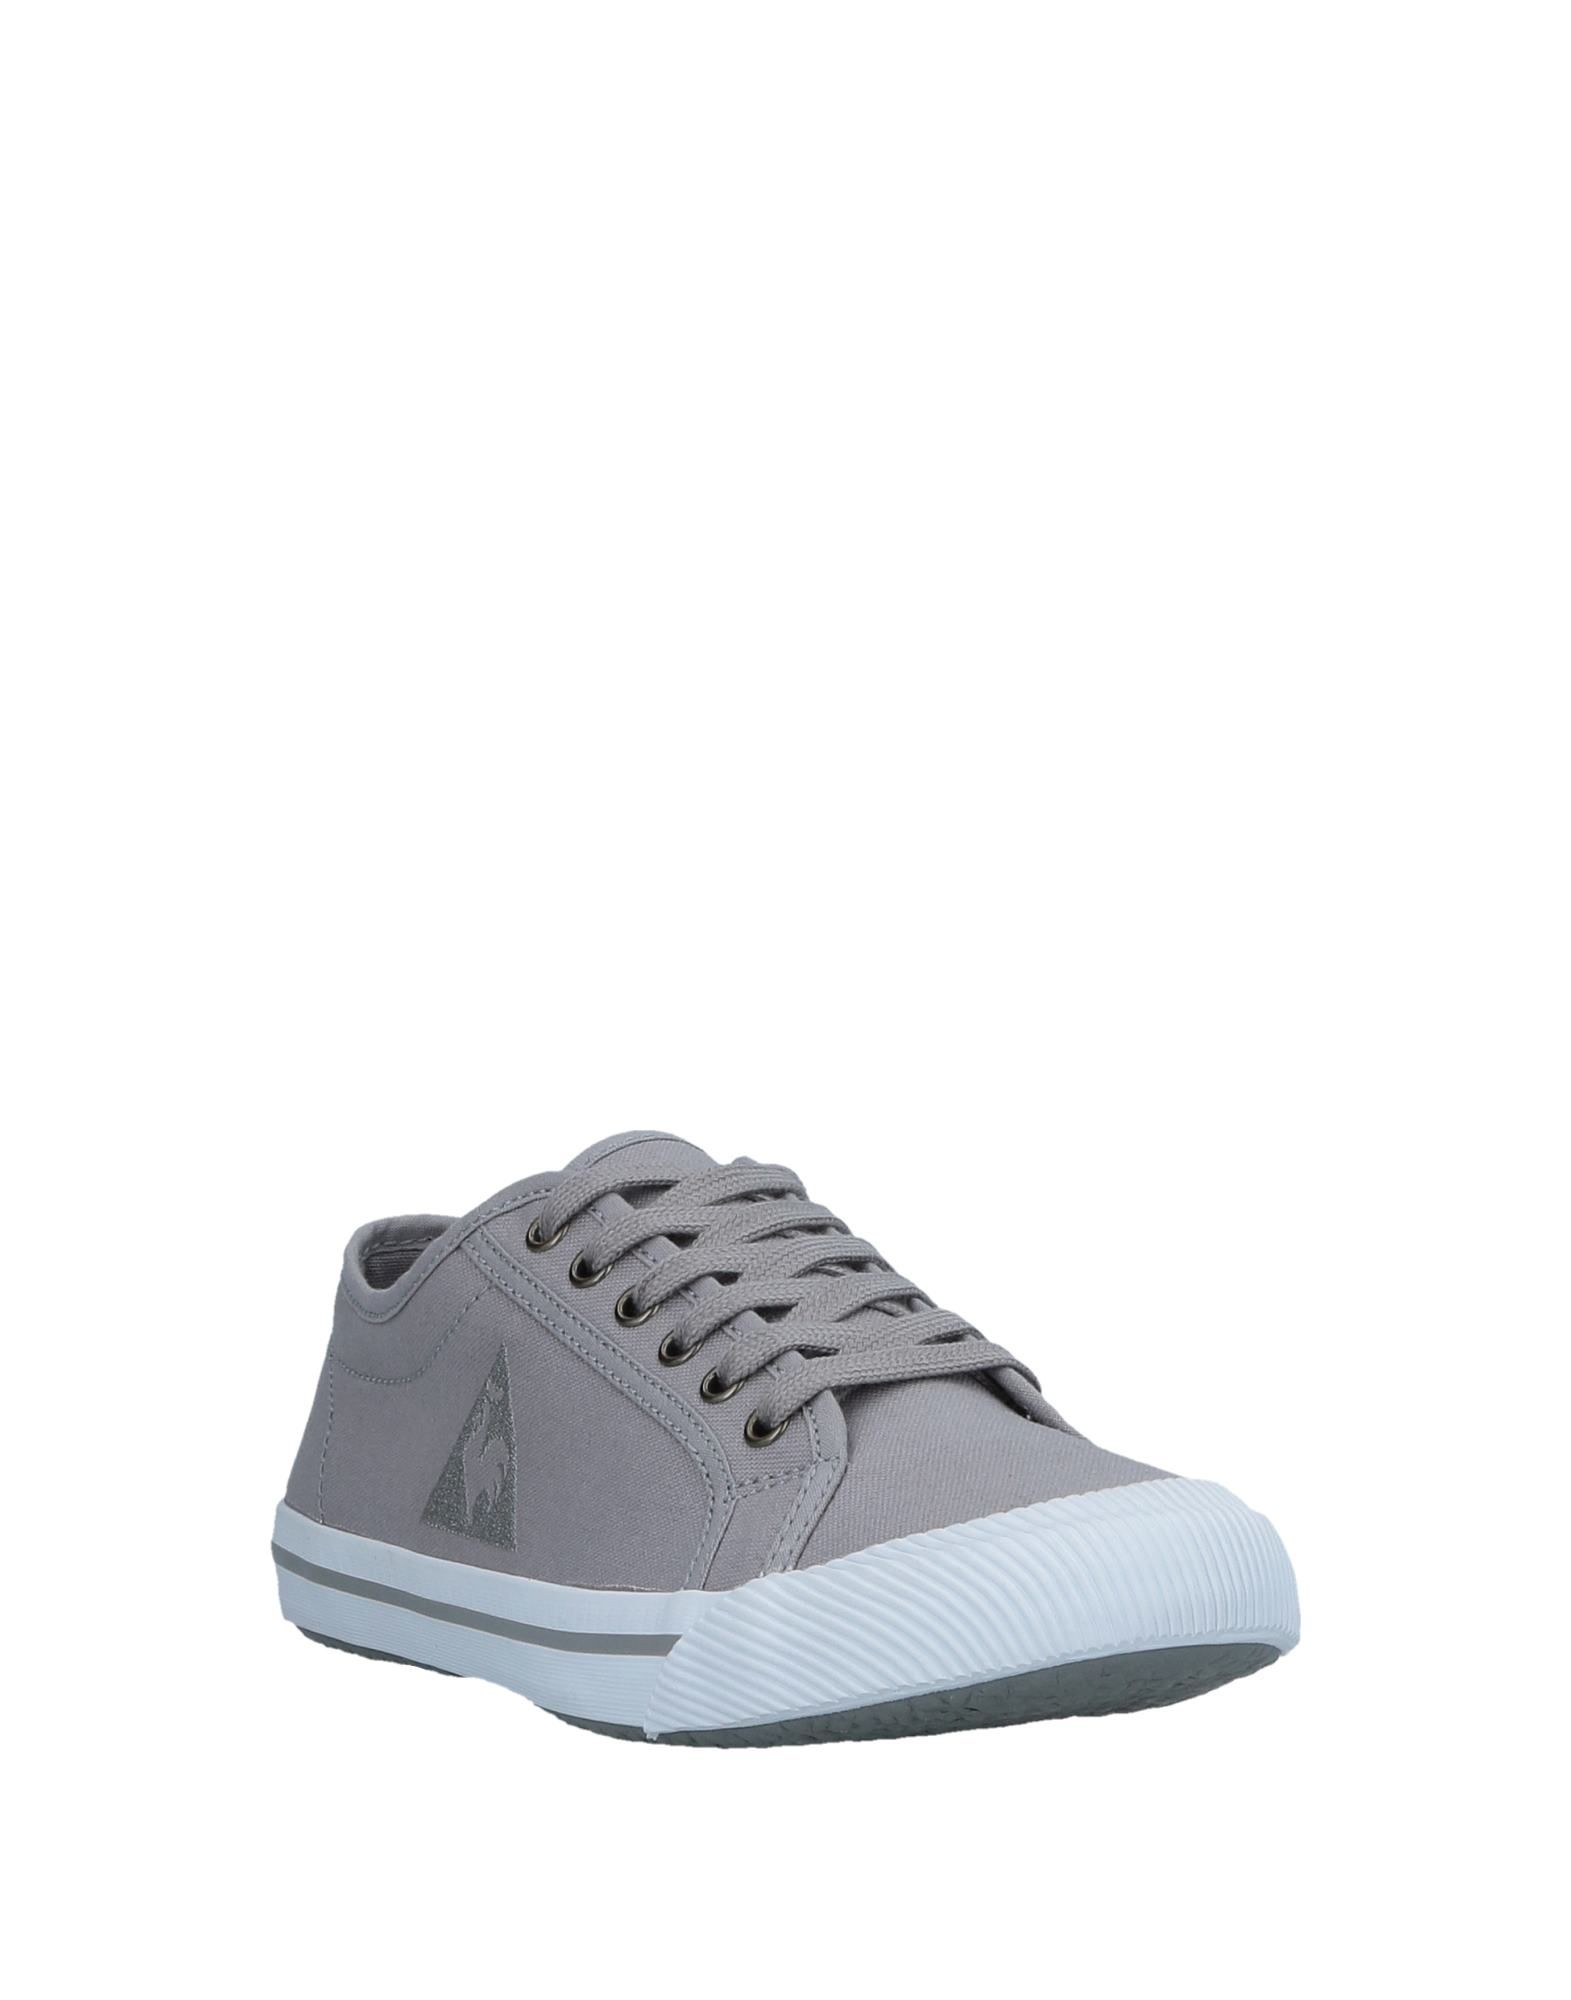 Sneakers Le Coq Sportif - Donna - Sportif 11533628OO daccf3